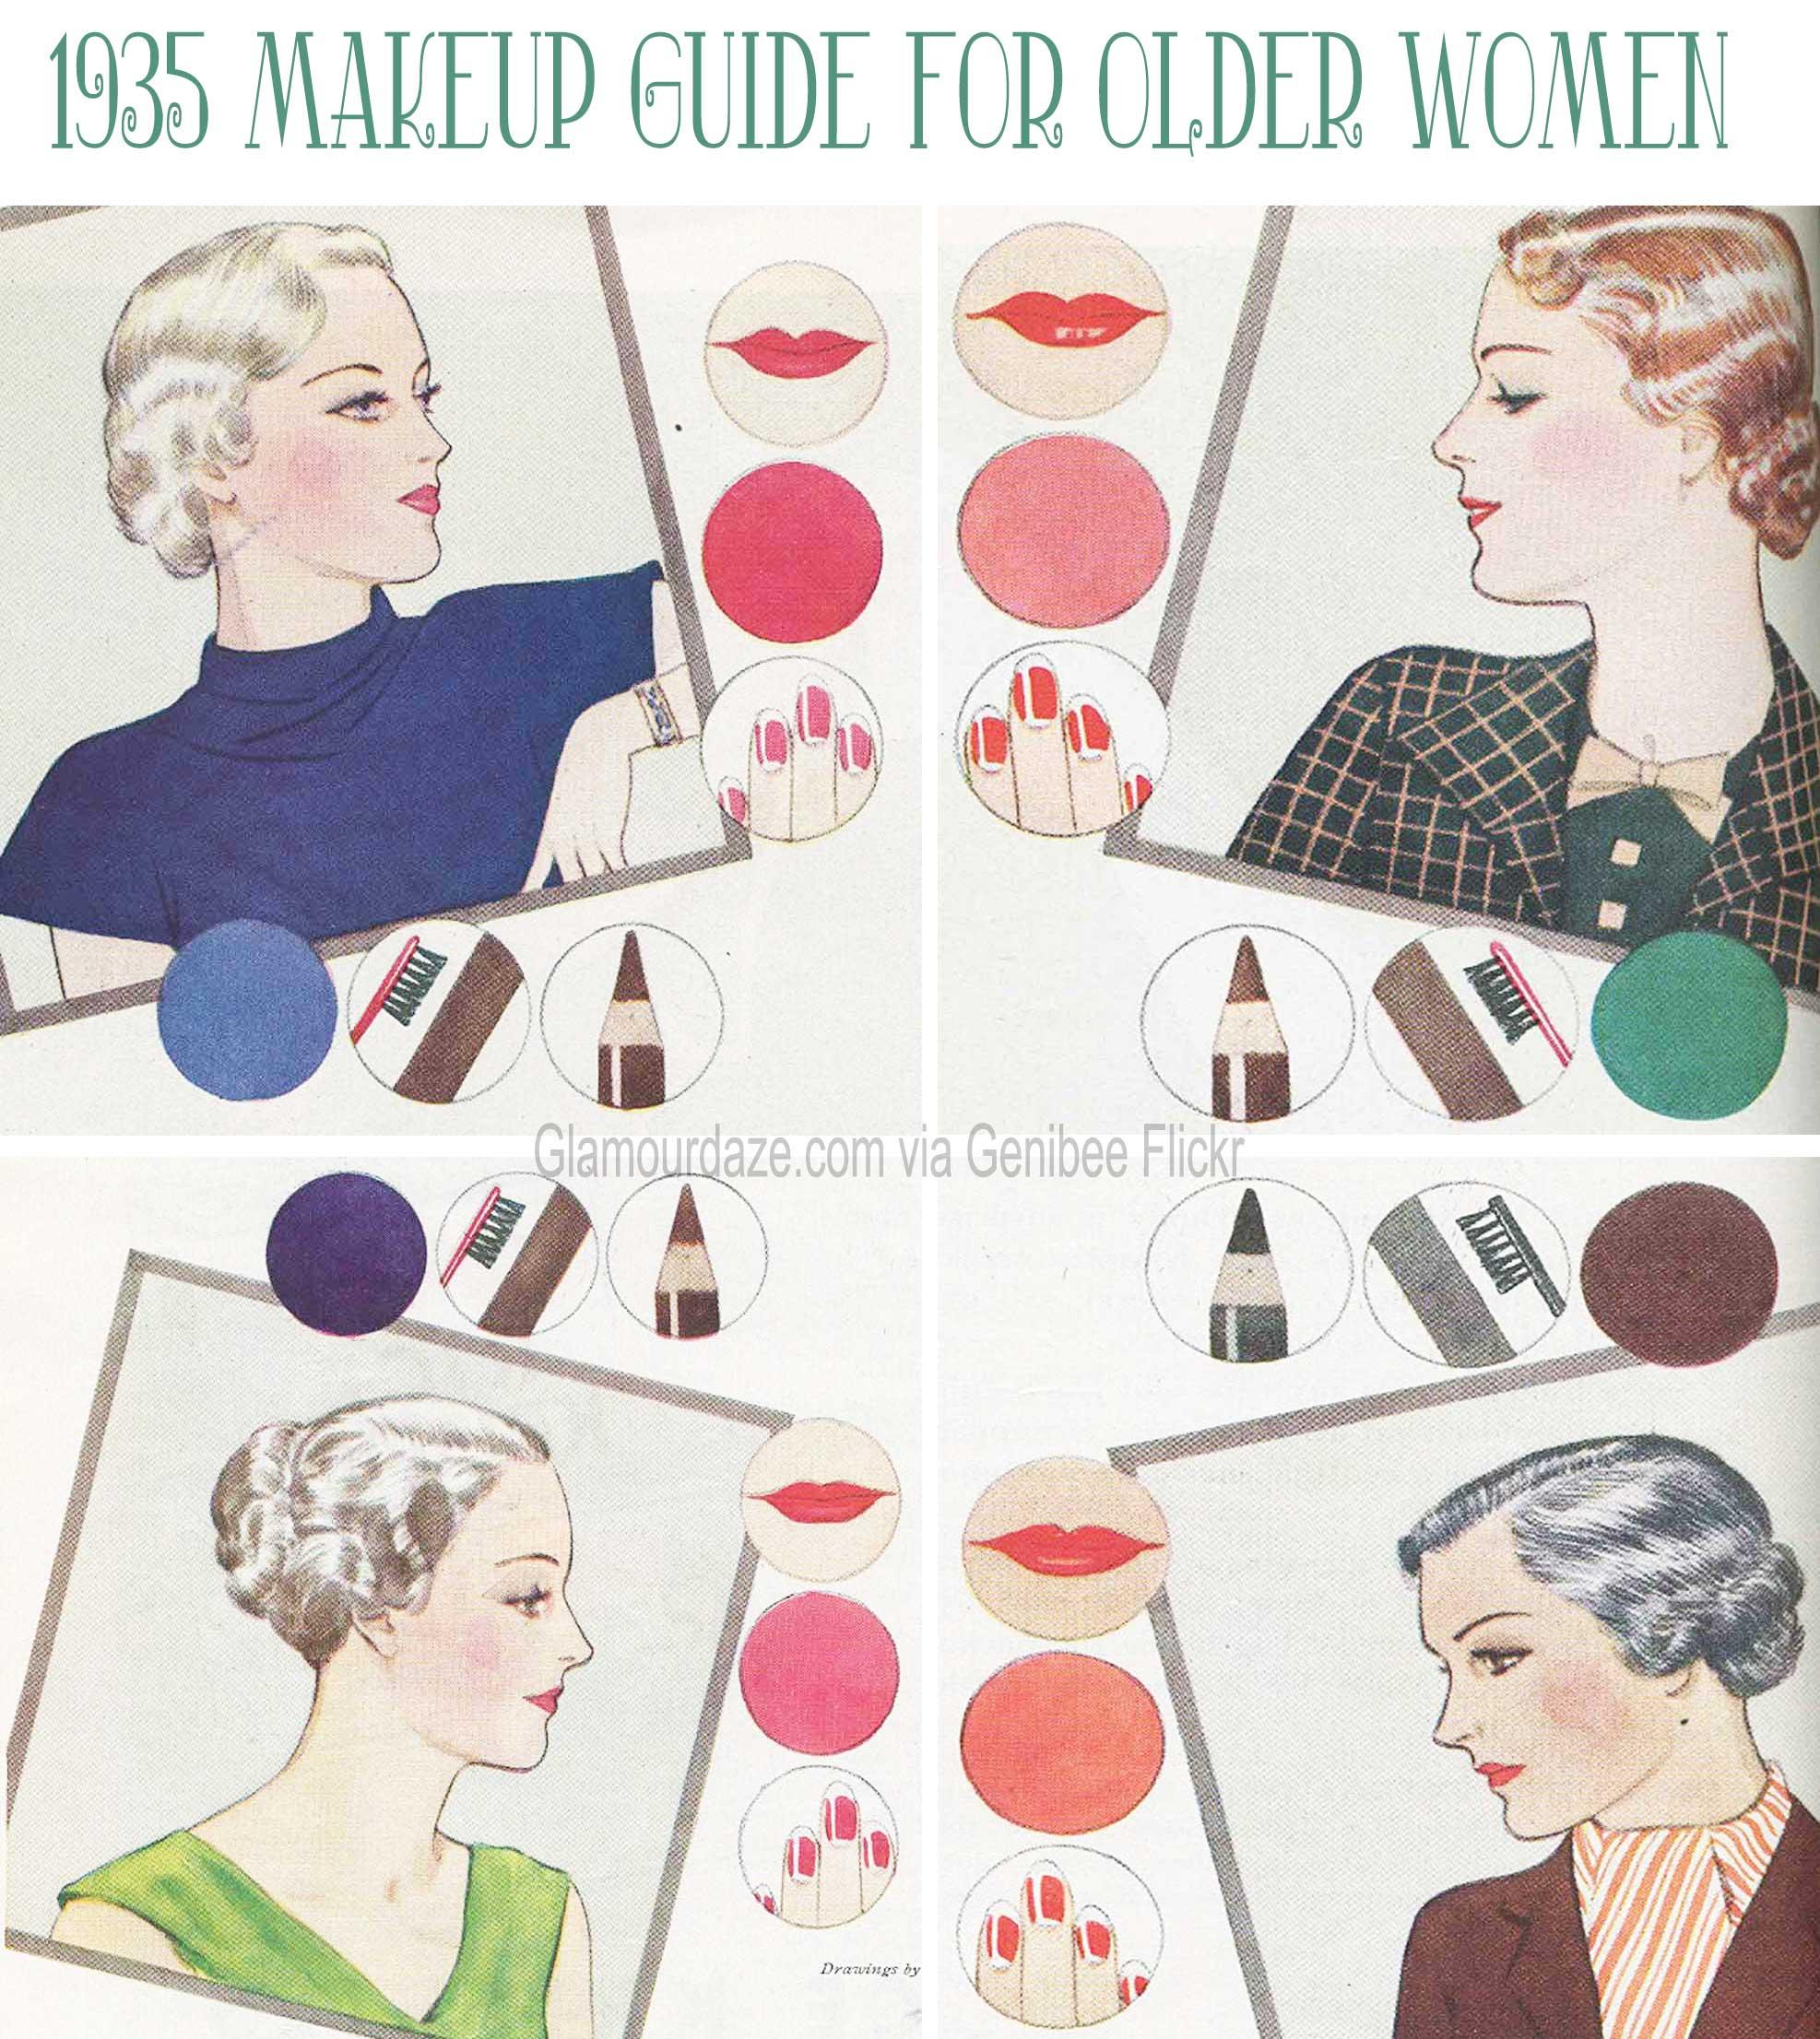 1935-Makeup-Guide-for-Older-Women